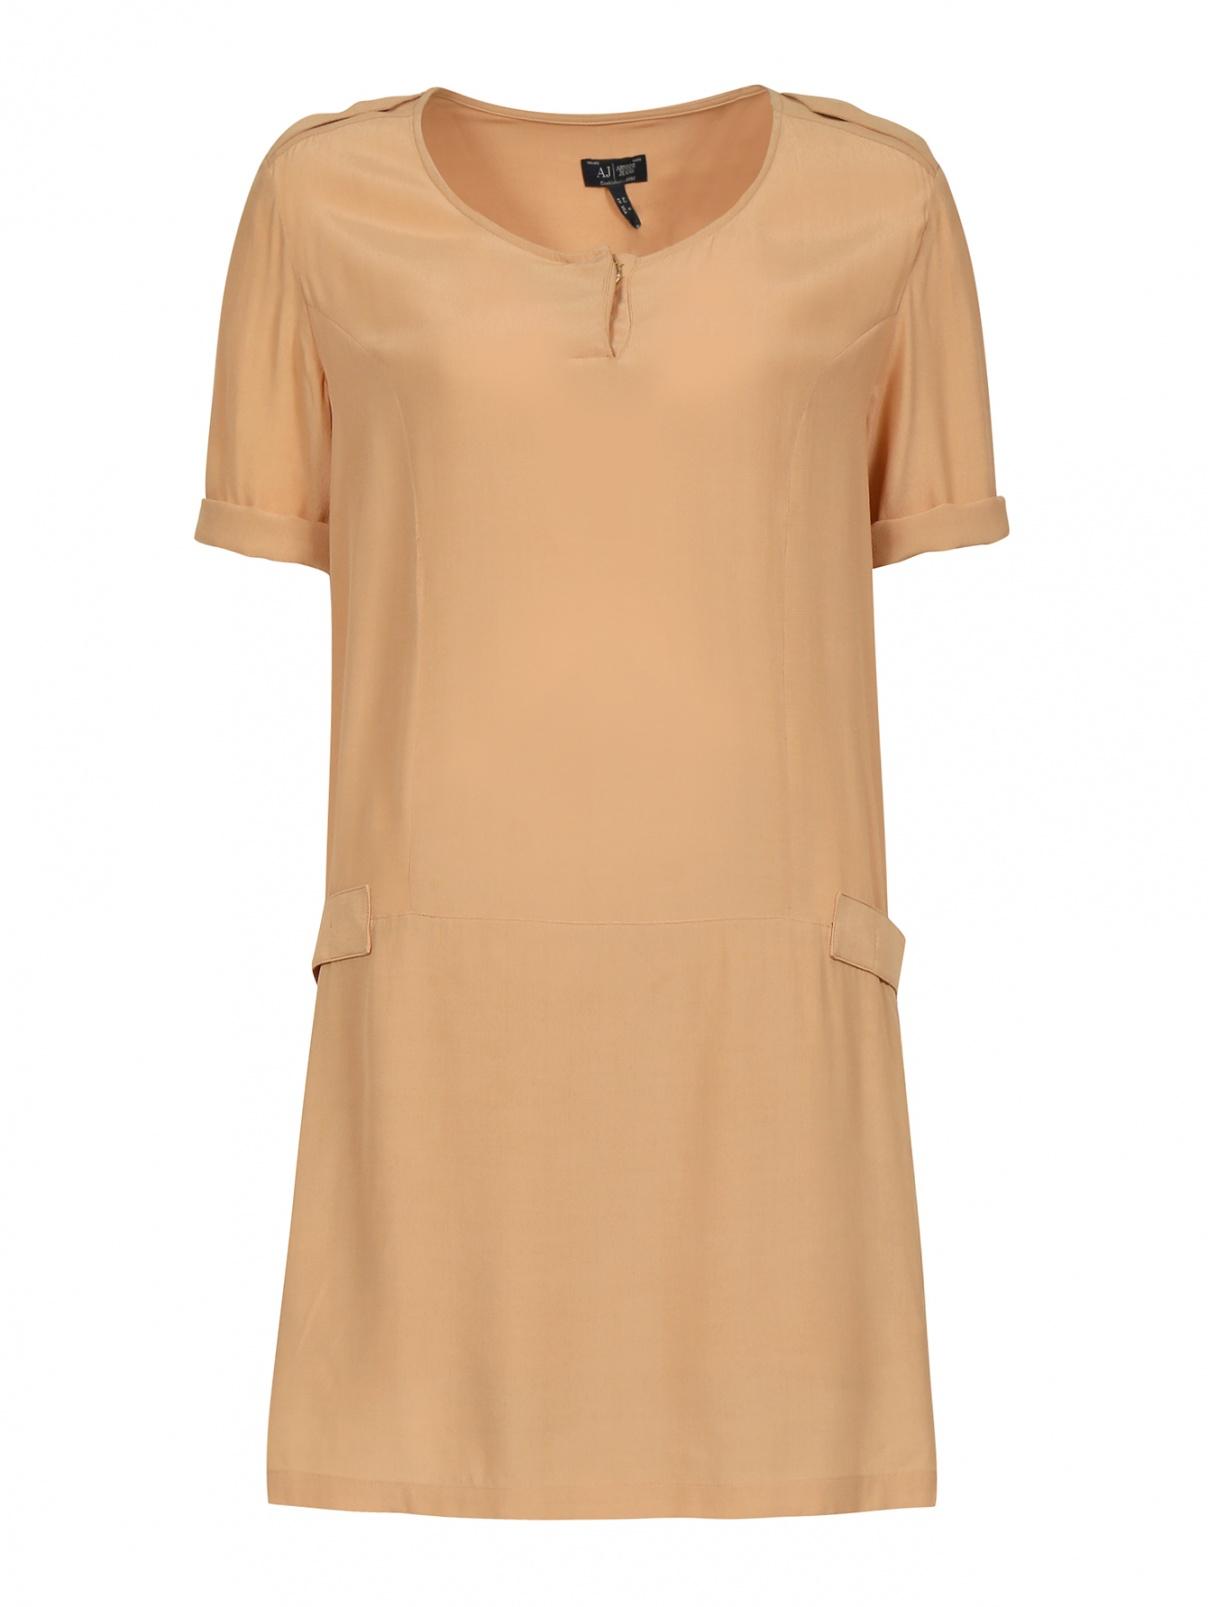 Свободное платье-мини с карманами на молнии Armani Jeans  –  Общий вид